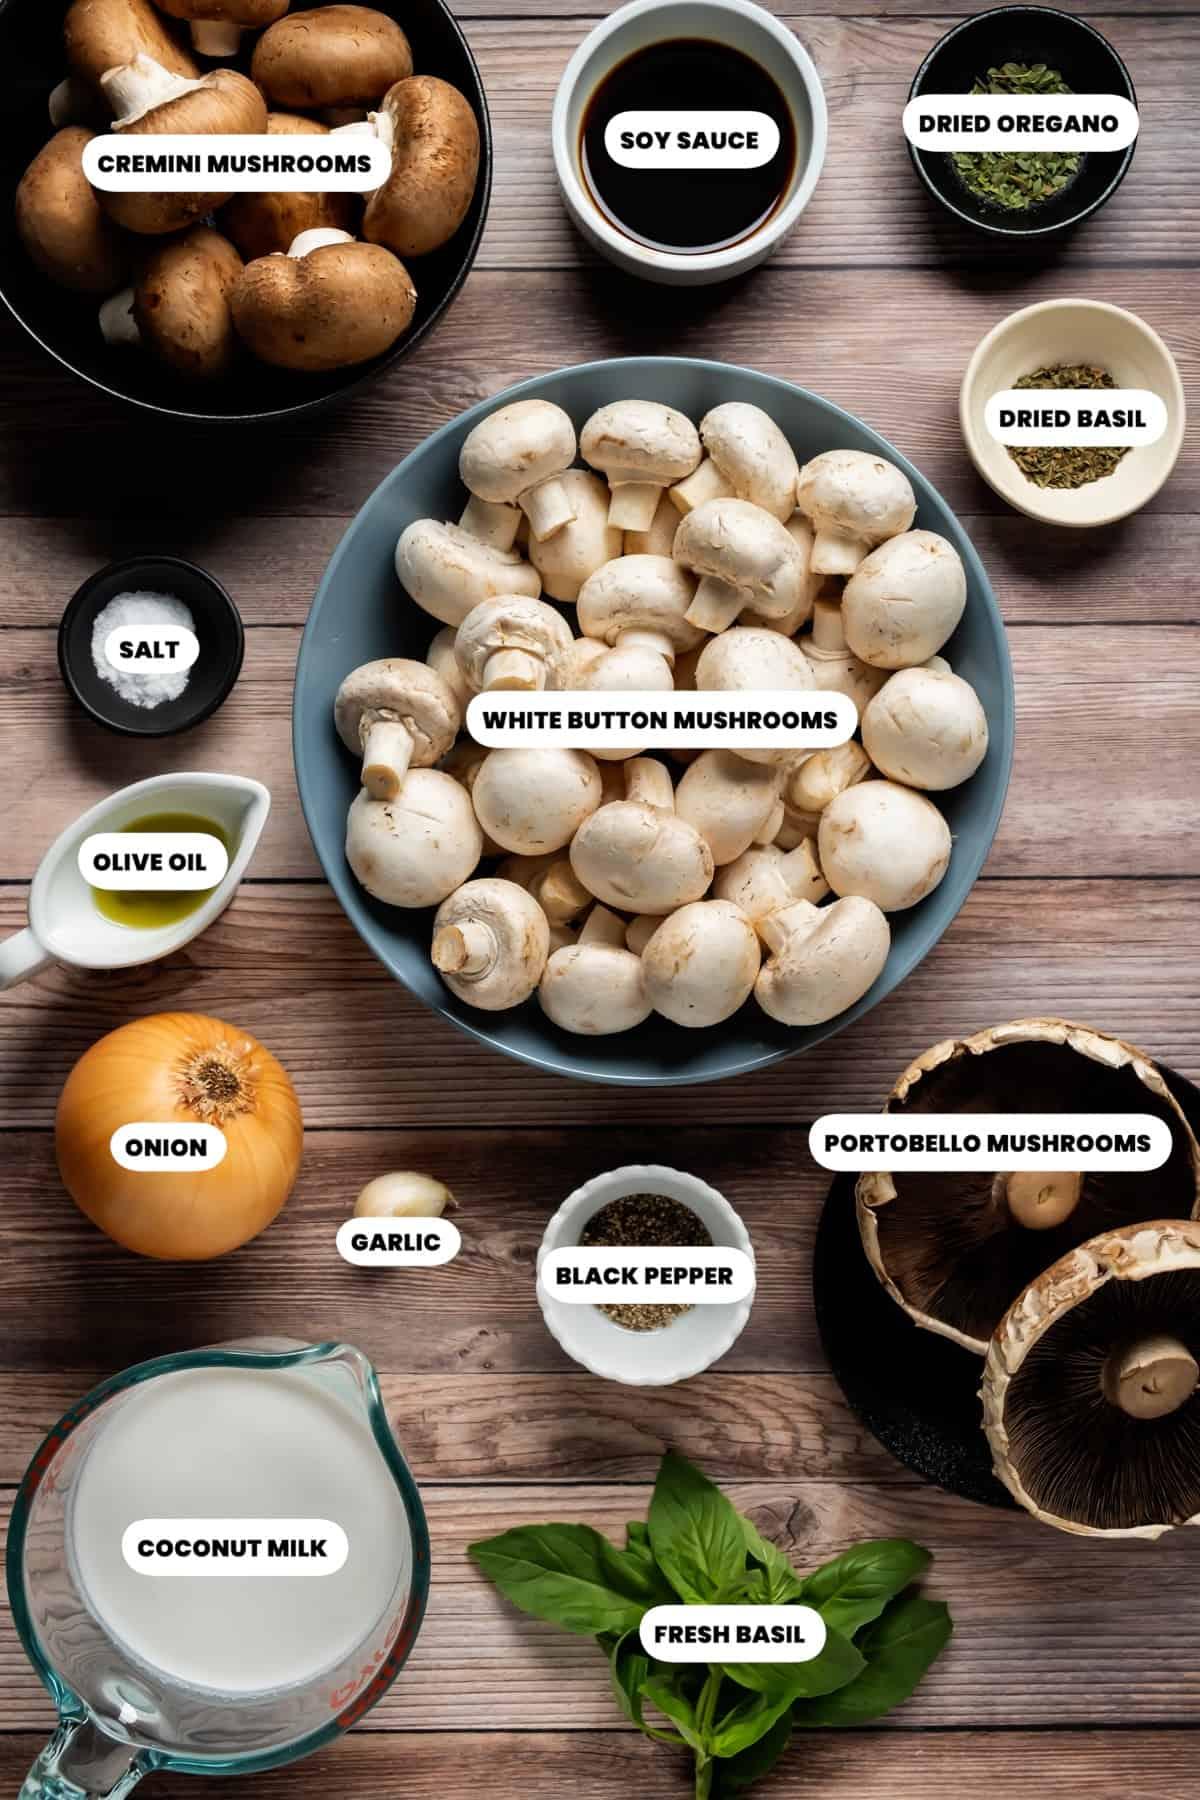 Photo of the ingredients needed to make vegan mushroom soup.